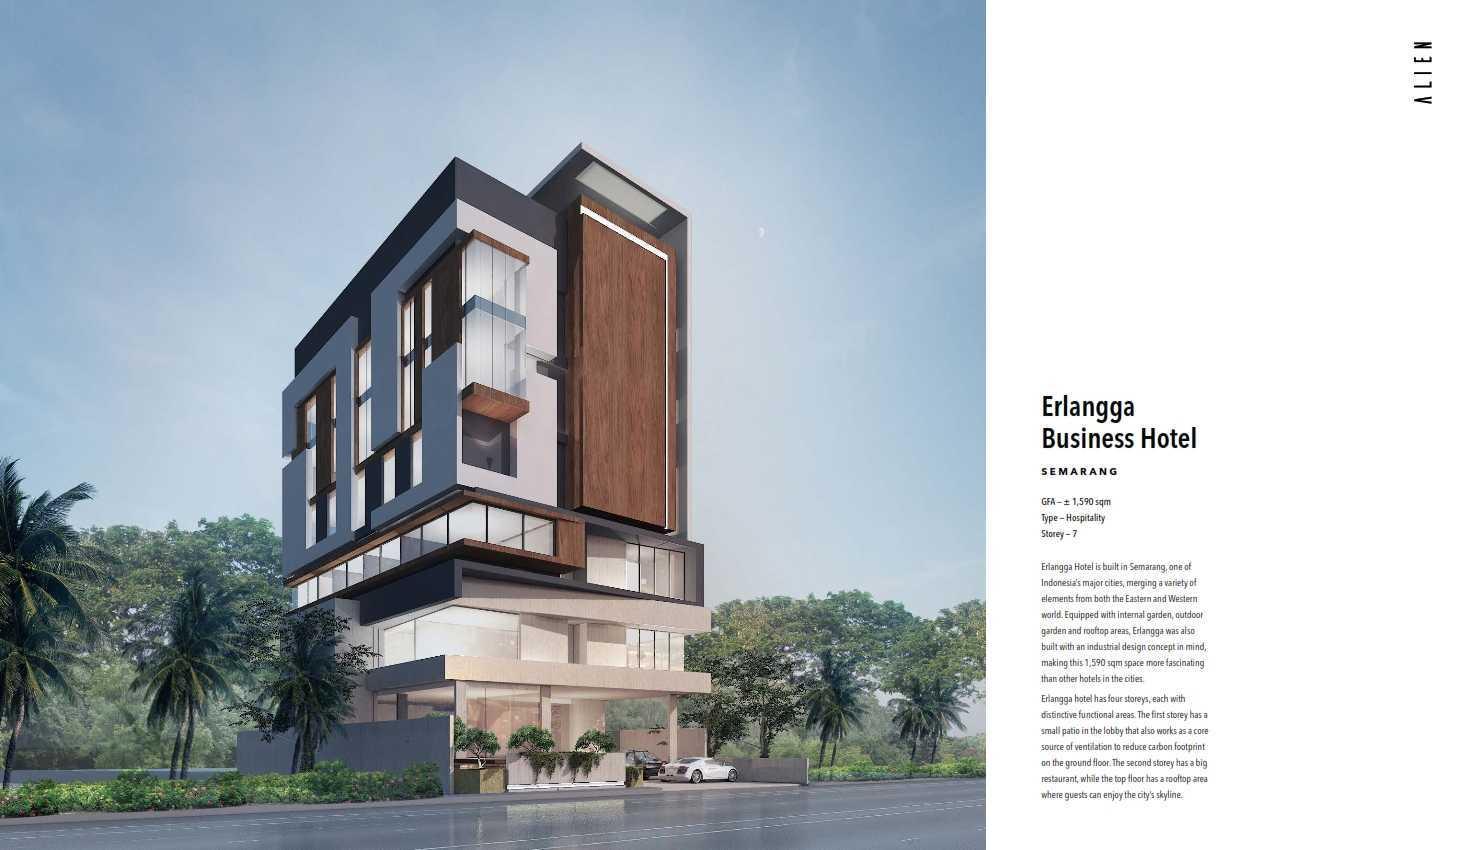 Alien Design Consultant Alien Dc Hotels & Resort Porto Palembang Palembang Aliencompro260Mmx300Mm12Updated054   44722